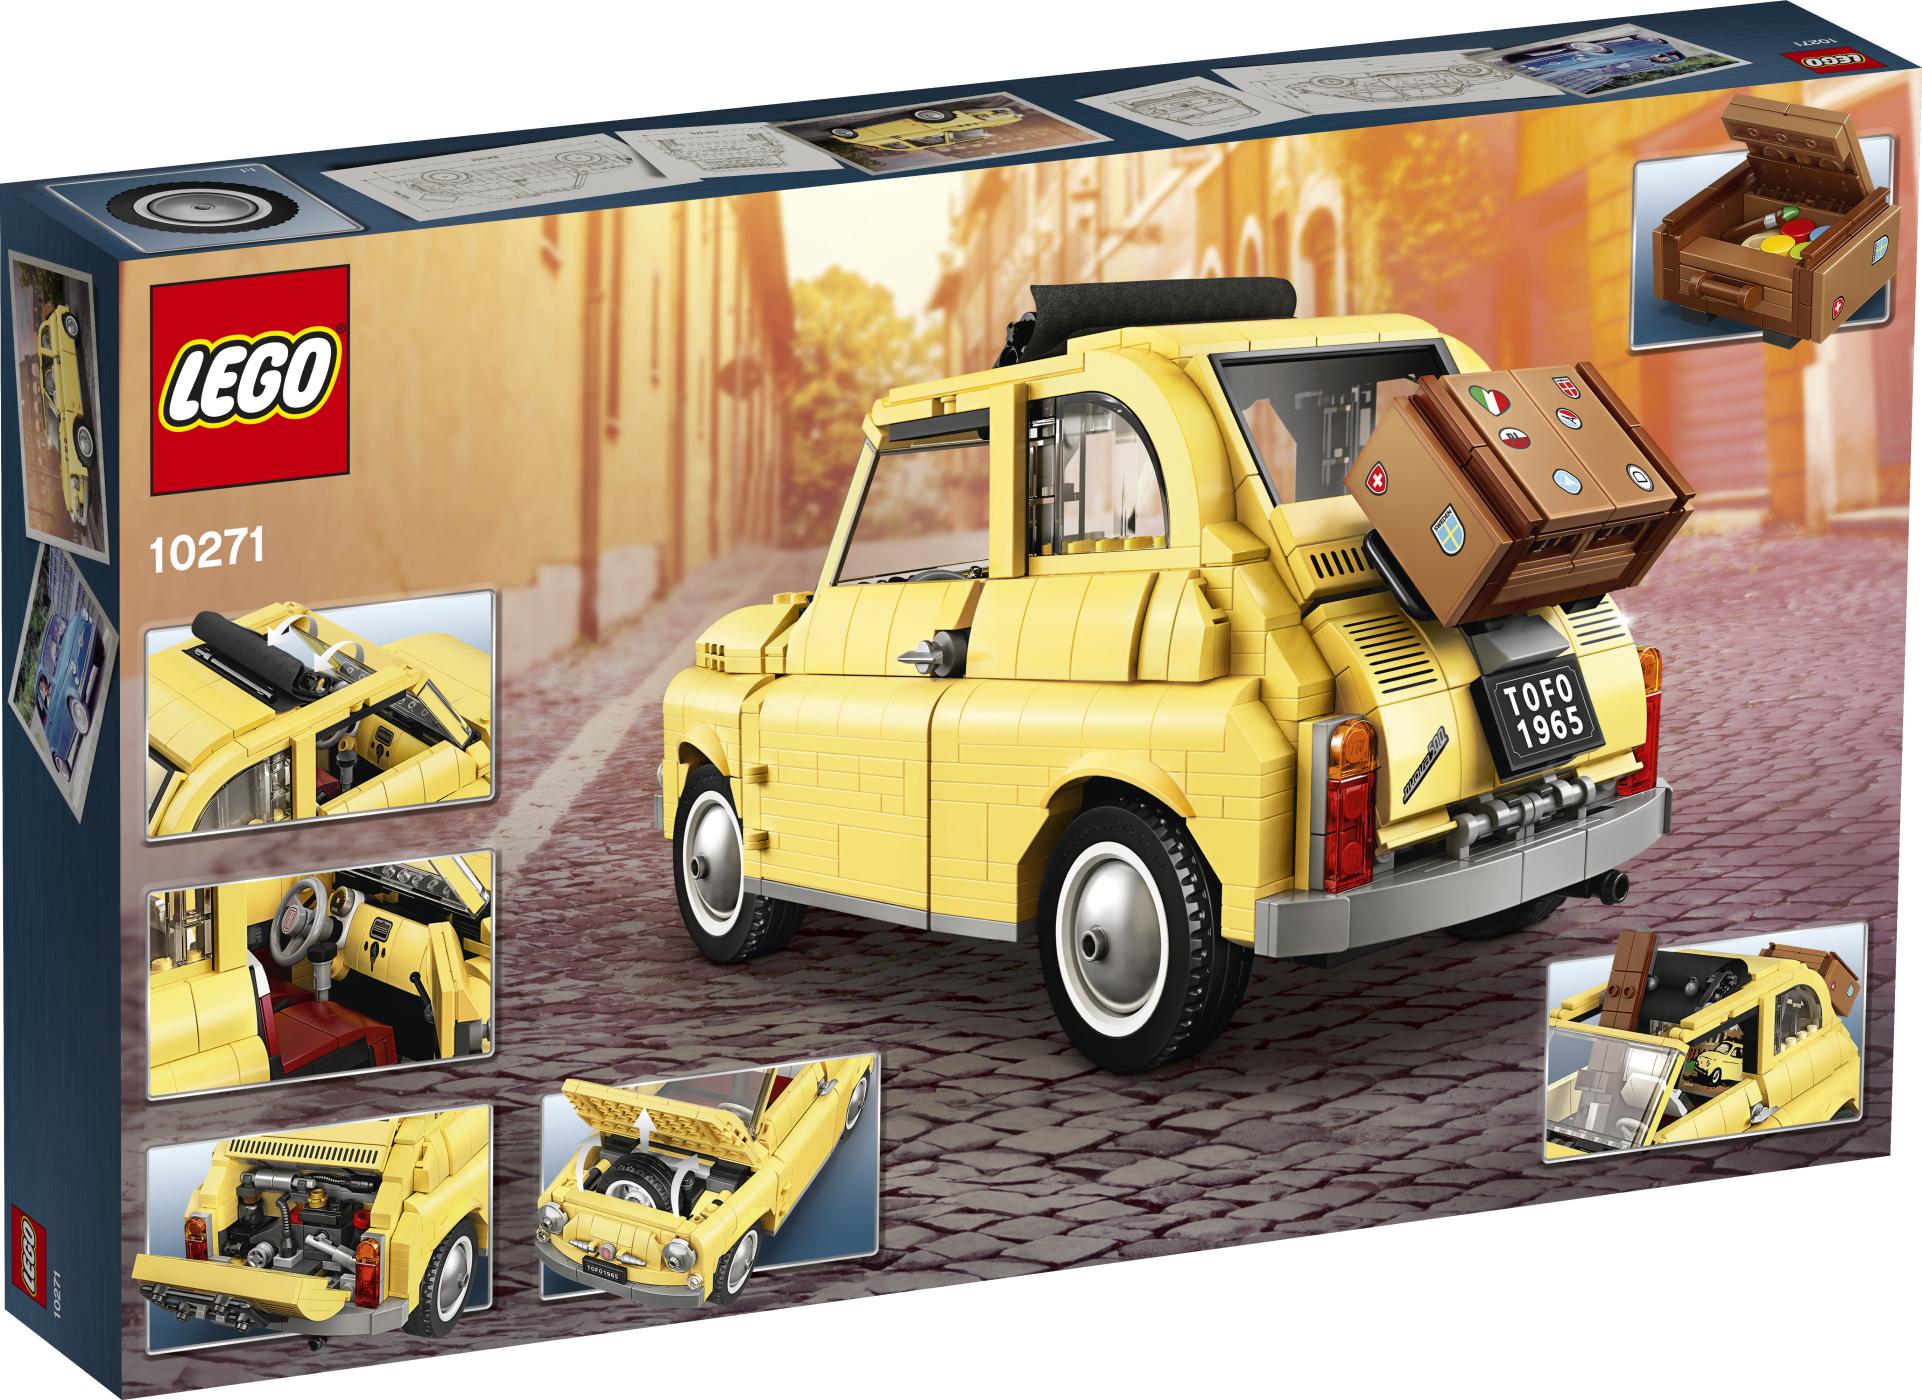 LEGO 10271 Creator Fiat Nuova 500